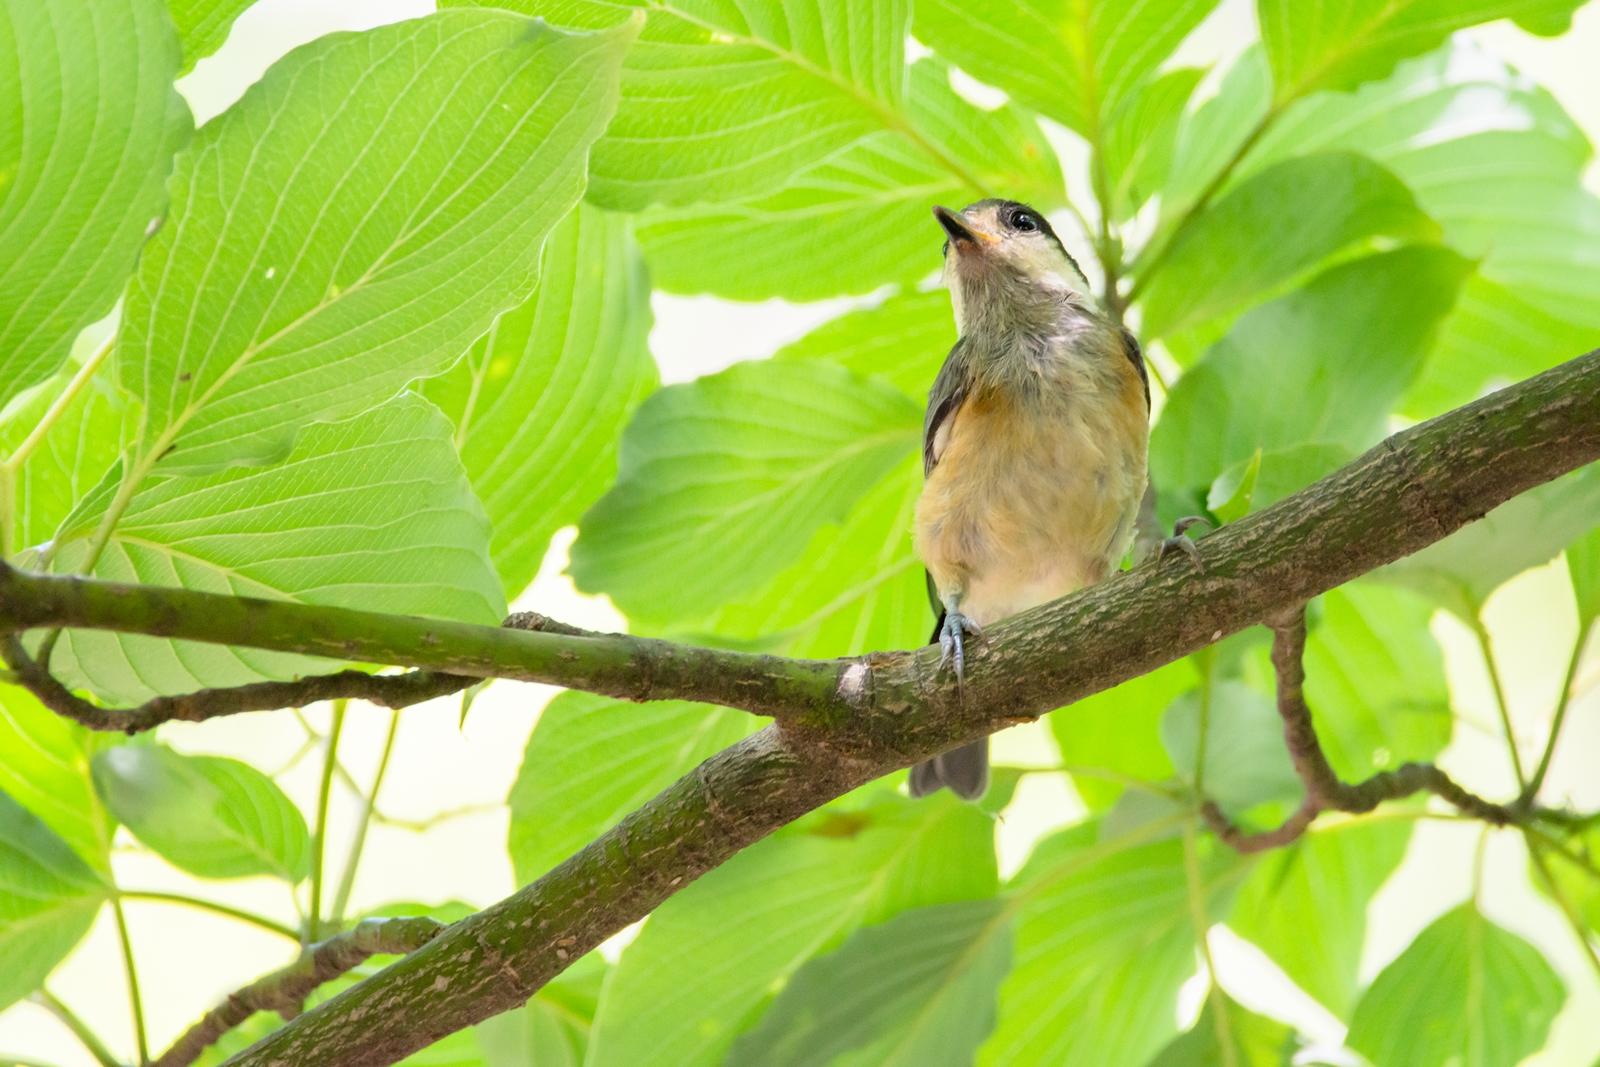 Photo: 無邪気な眼差し Innocent eyes.  見るものすべてが 新しいものばかり このわくわくする気持ち 染まらない純粋な気持ち  Juvenile of Varied tit. (ヤマガラの幼鳥)  #birdphotography #birds  #cooljapan #kawaii  #nikon #sigma   Nikon D7200 SIGMA 150-600mm F5-6.3 DG OS HSM Contemporary  ・小鳥の詩朗読 /poetry reading https://youtu.be/odryC9UlBwA?list=PL2YtHGm0-R3qVsaqvQe9OYdJFCkI98wzF